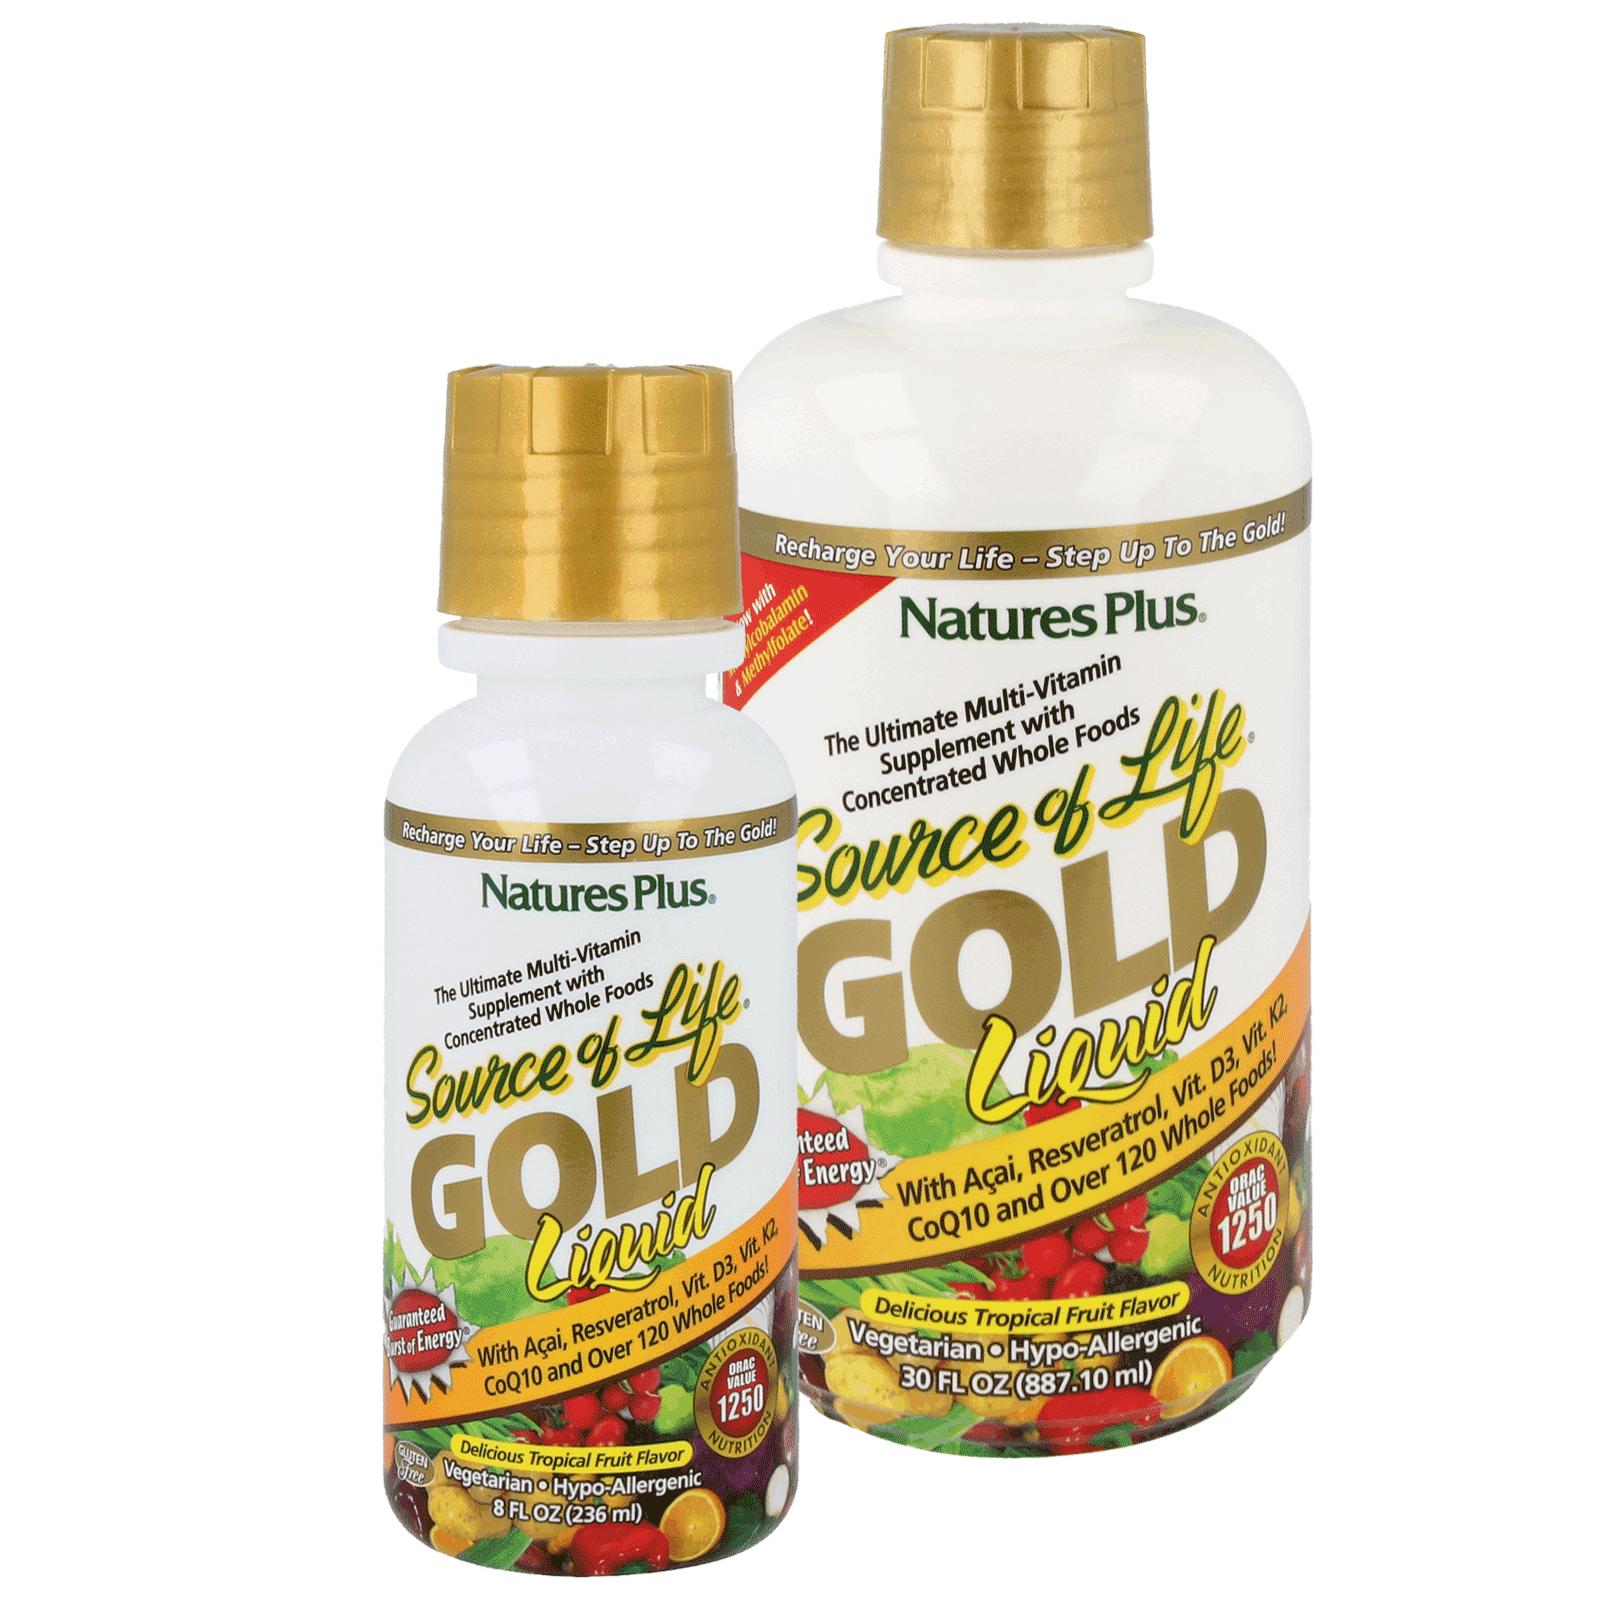 Source of Life® GOLD Liquid